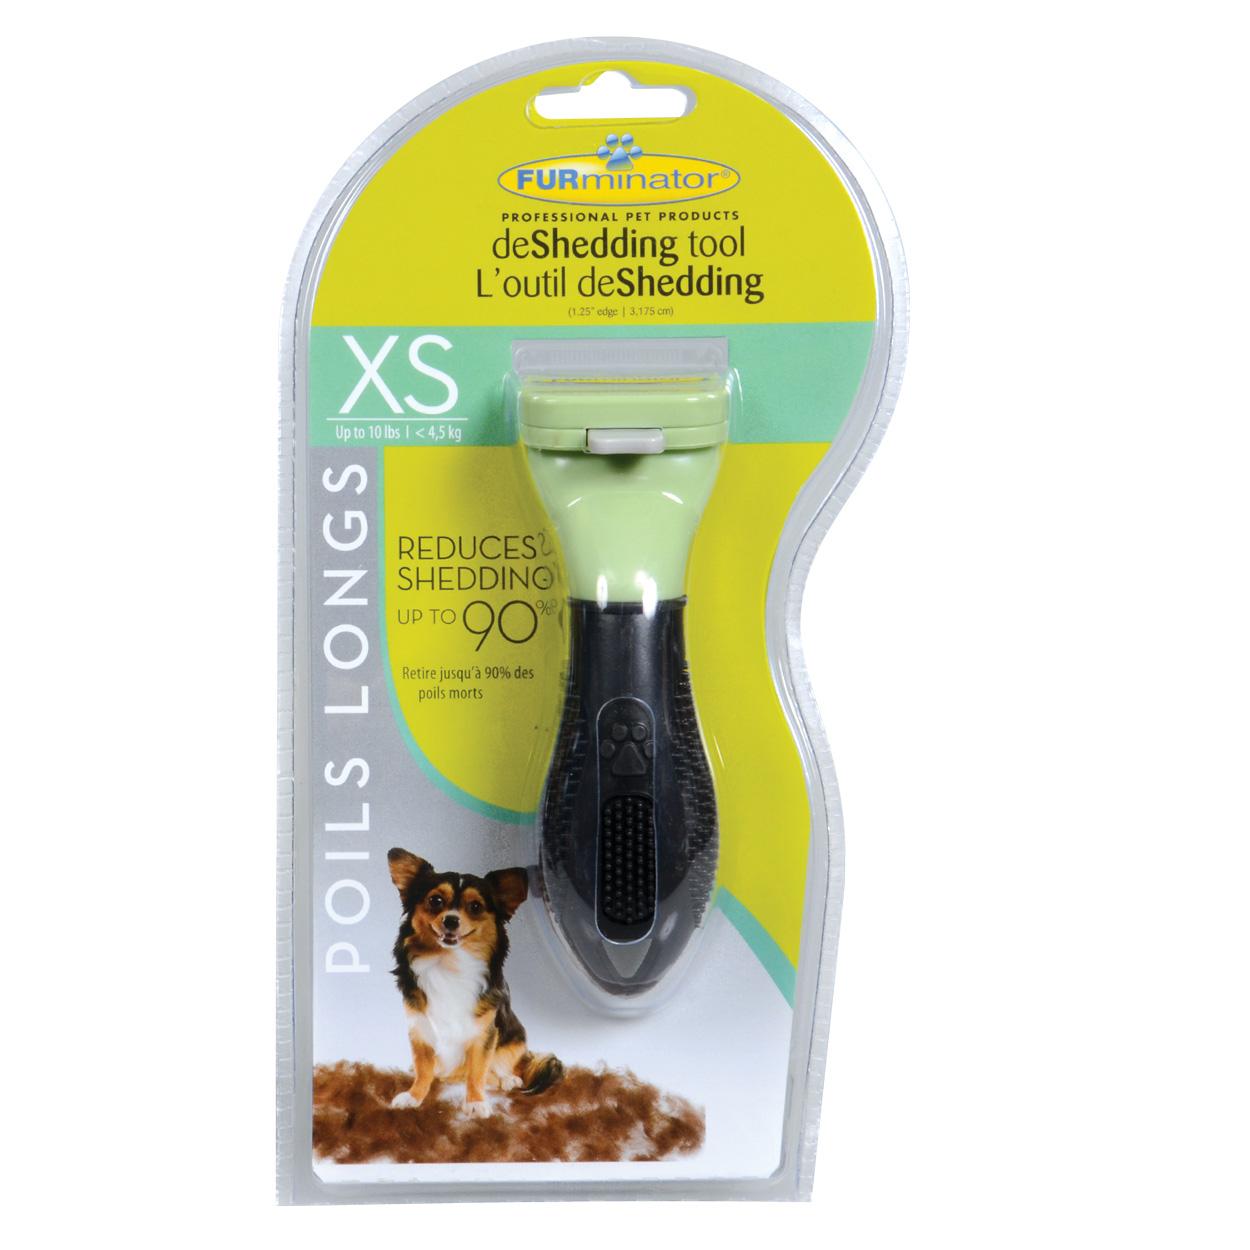 "FURminator Long Hair deShedding Tool for Dogs - XS - 1.25"" 10749"